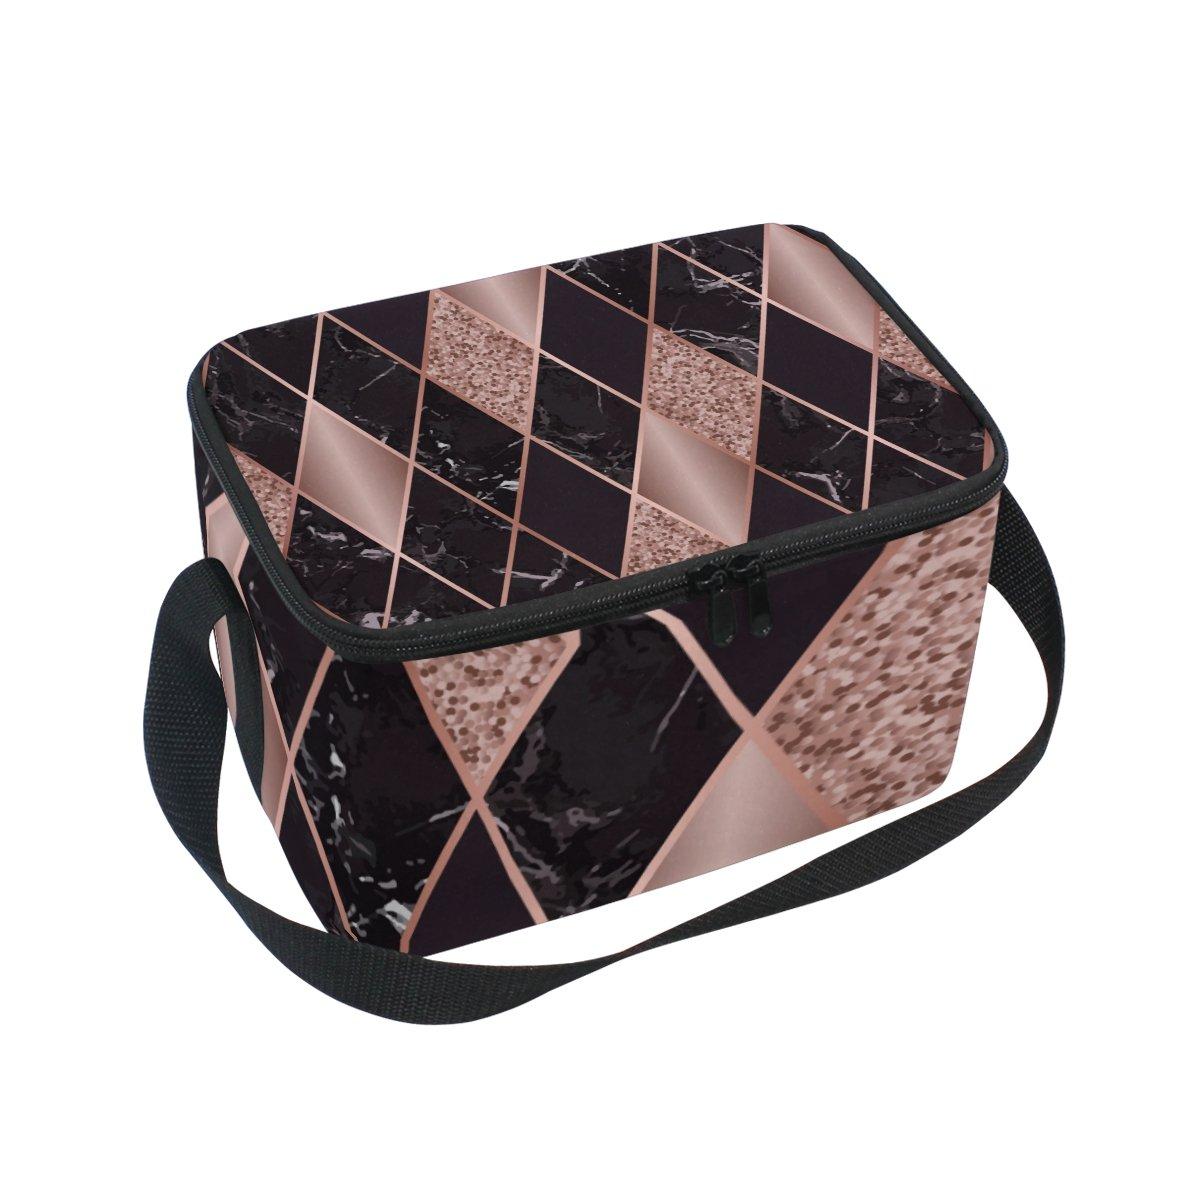 0207fb79c496 Amazon.com: Vantaso Lunch Cooler Bag Insulated Marble And Quartz ...